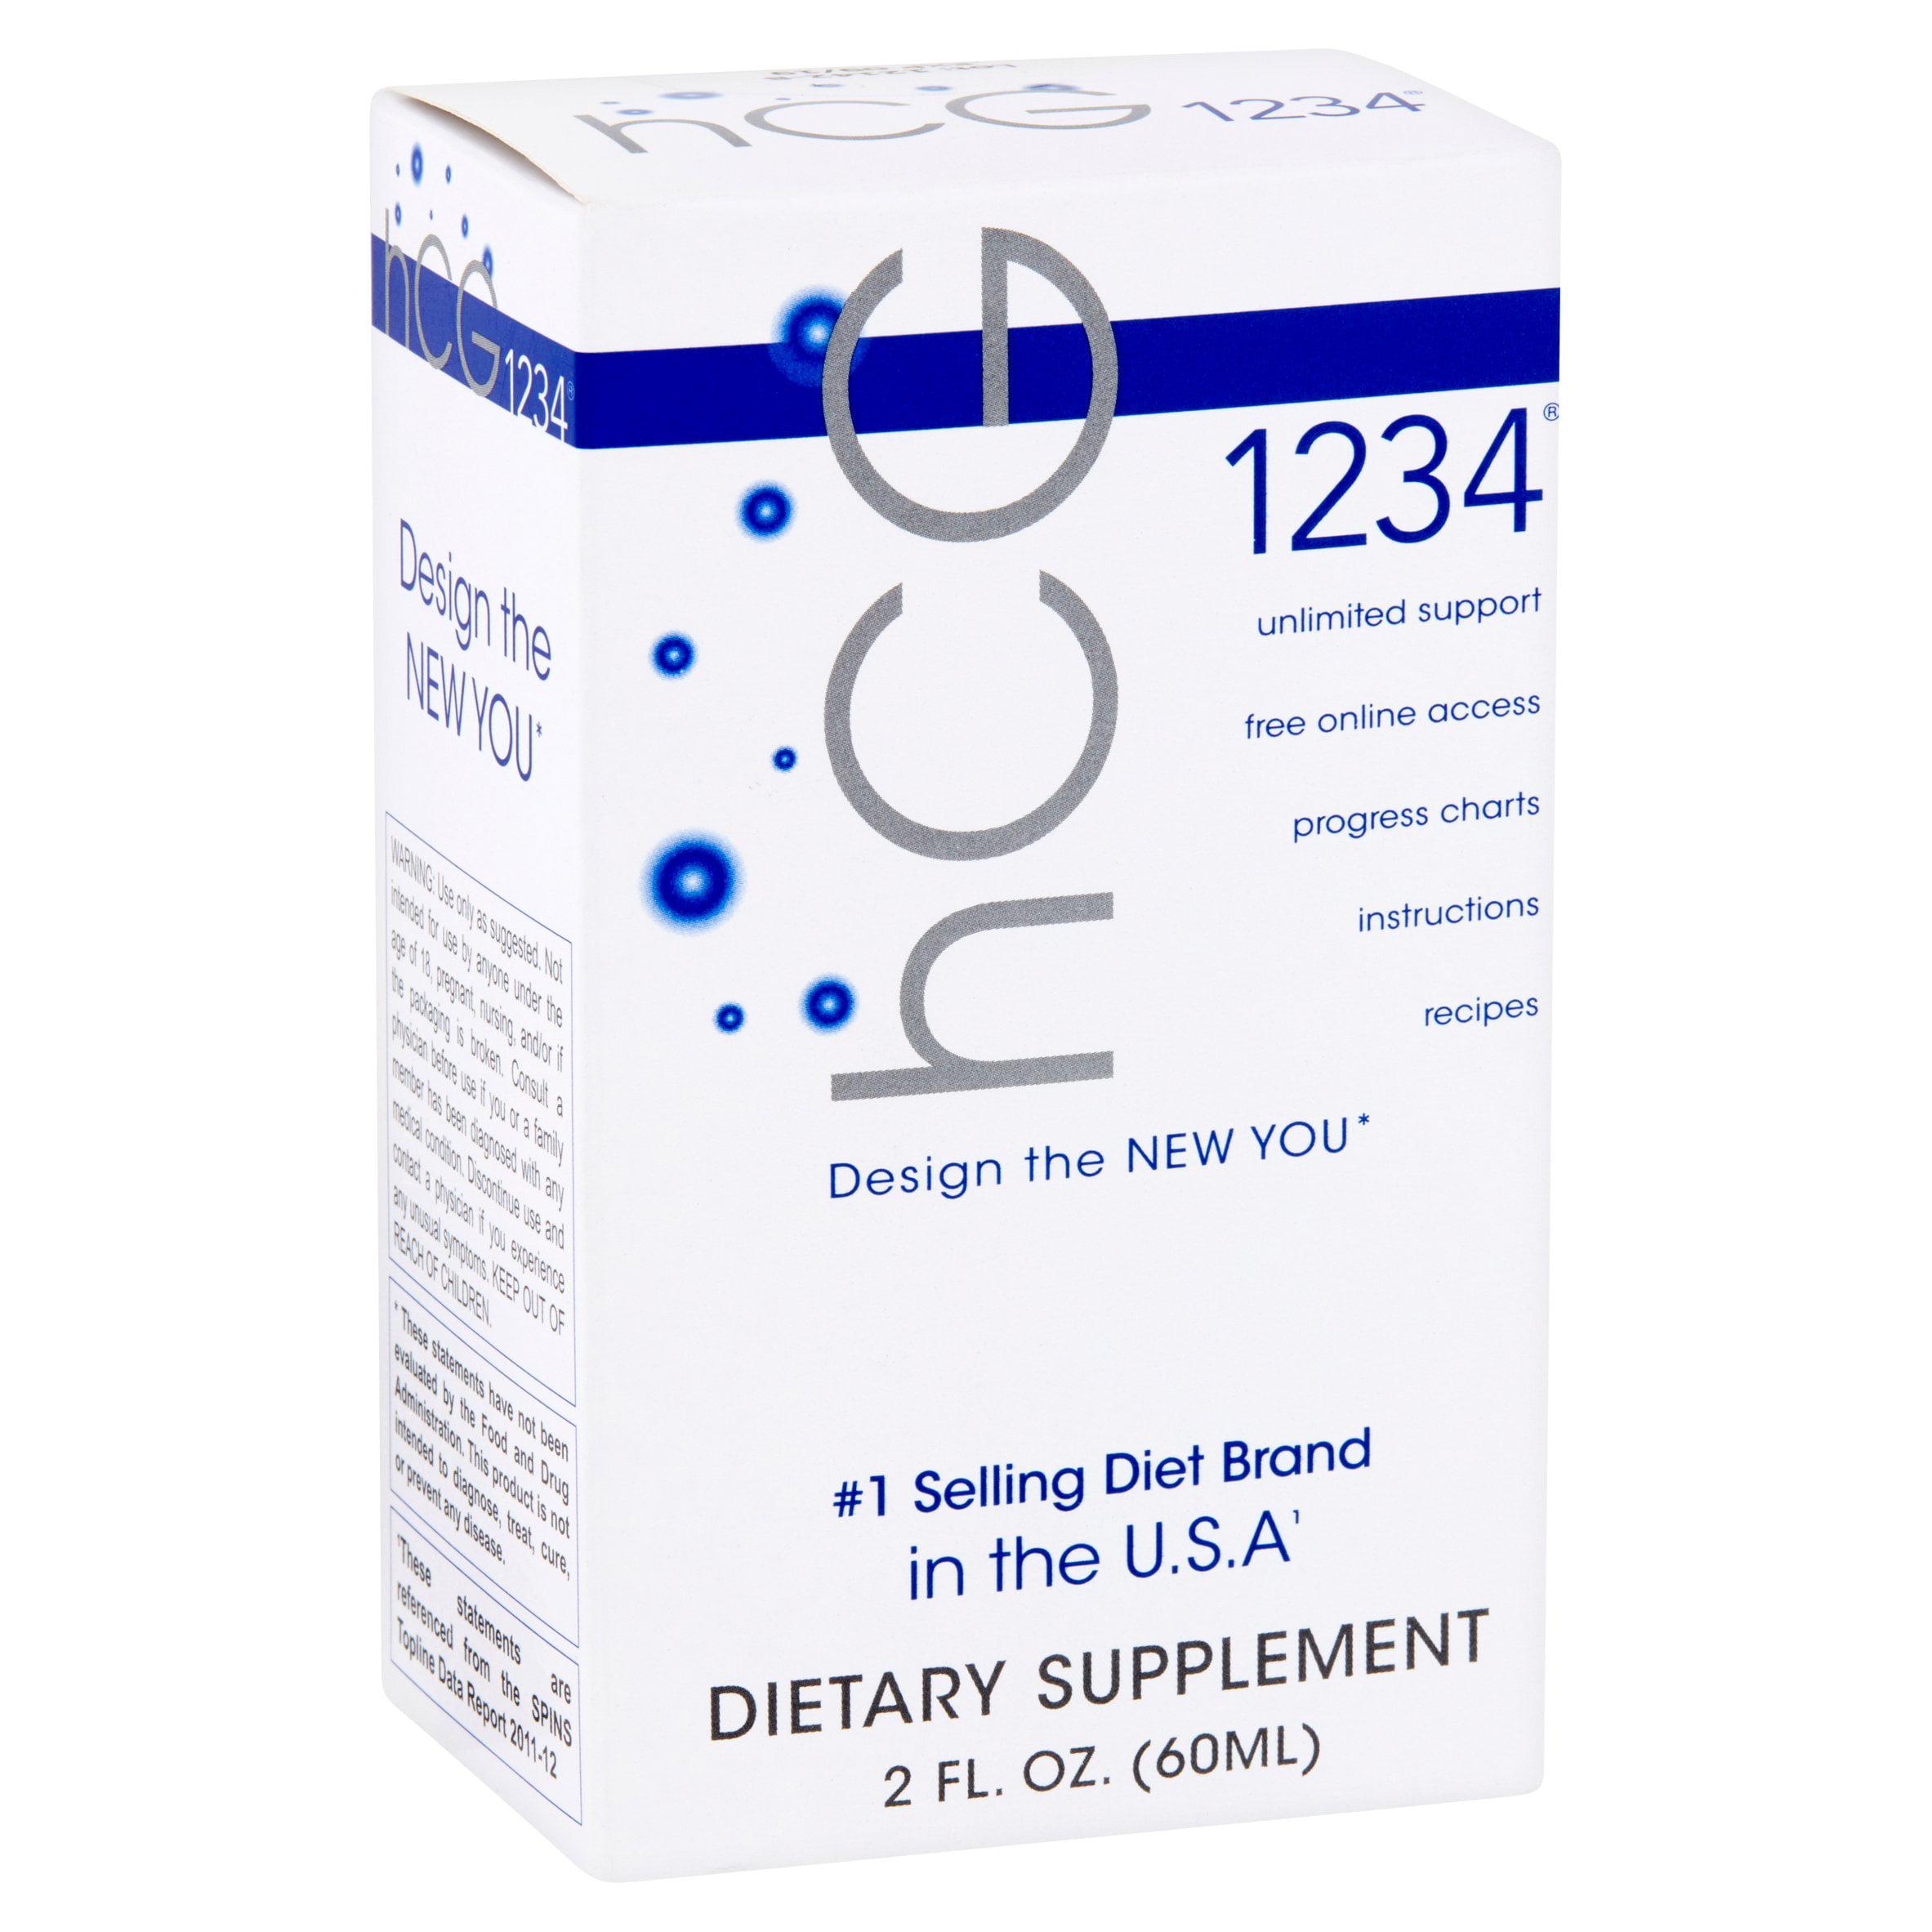 Hcg 1234 dietary supplement 2 fl oz walmart nvjuhfo Image collections